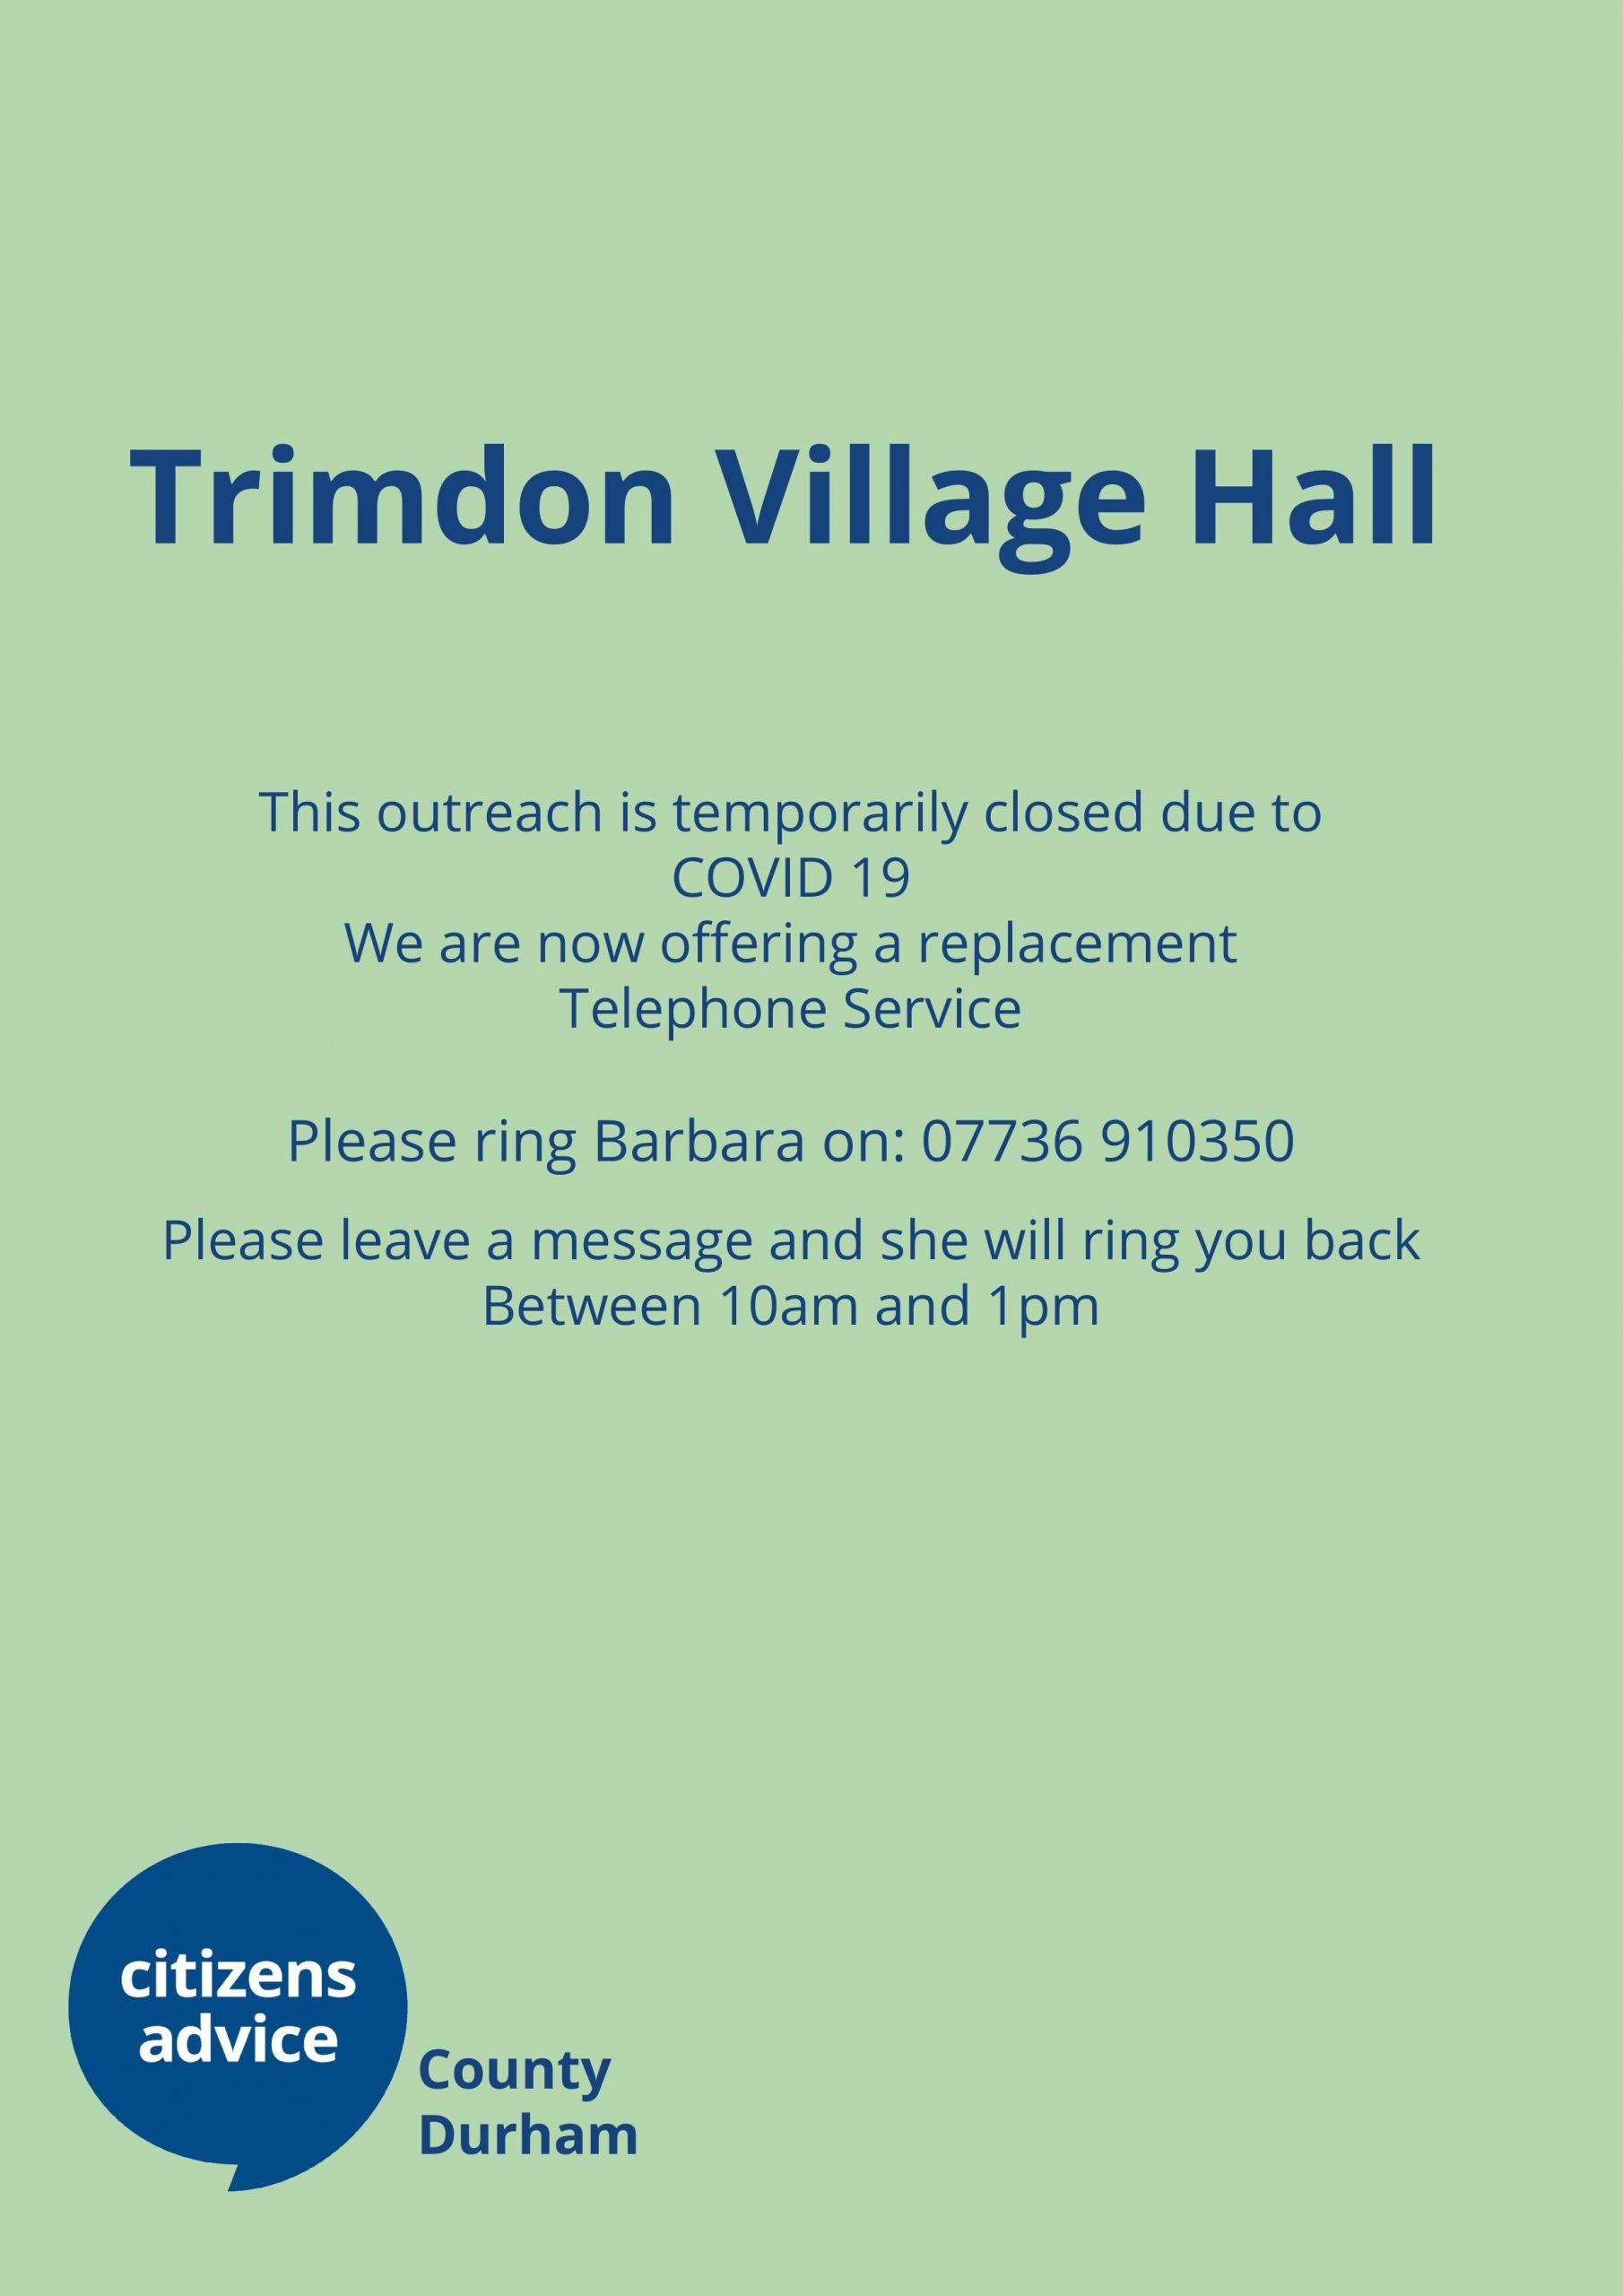 Trimdon – Outreach closed but please call…